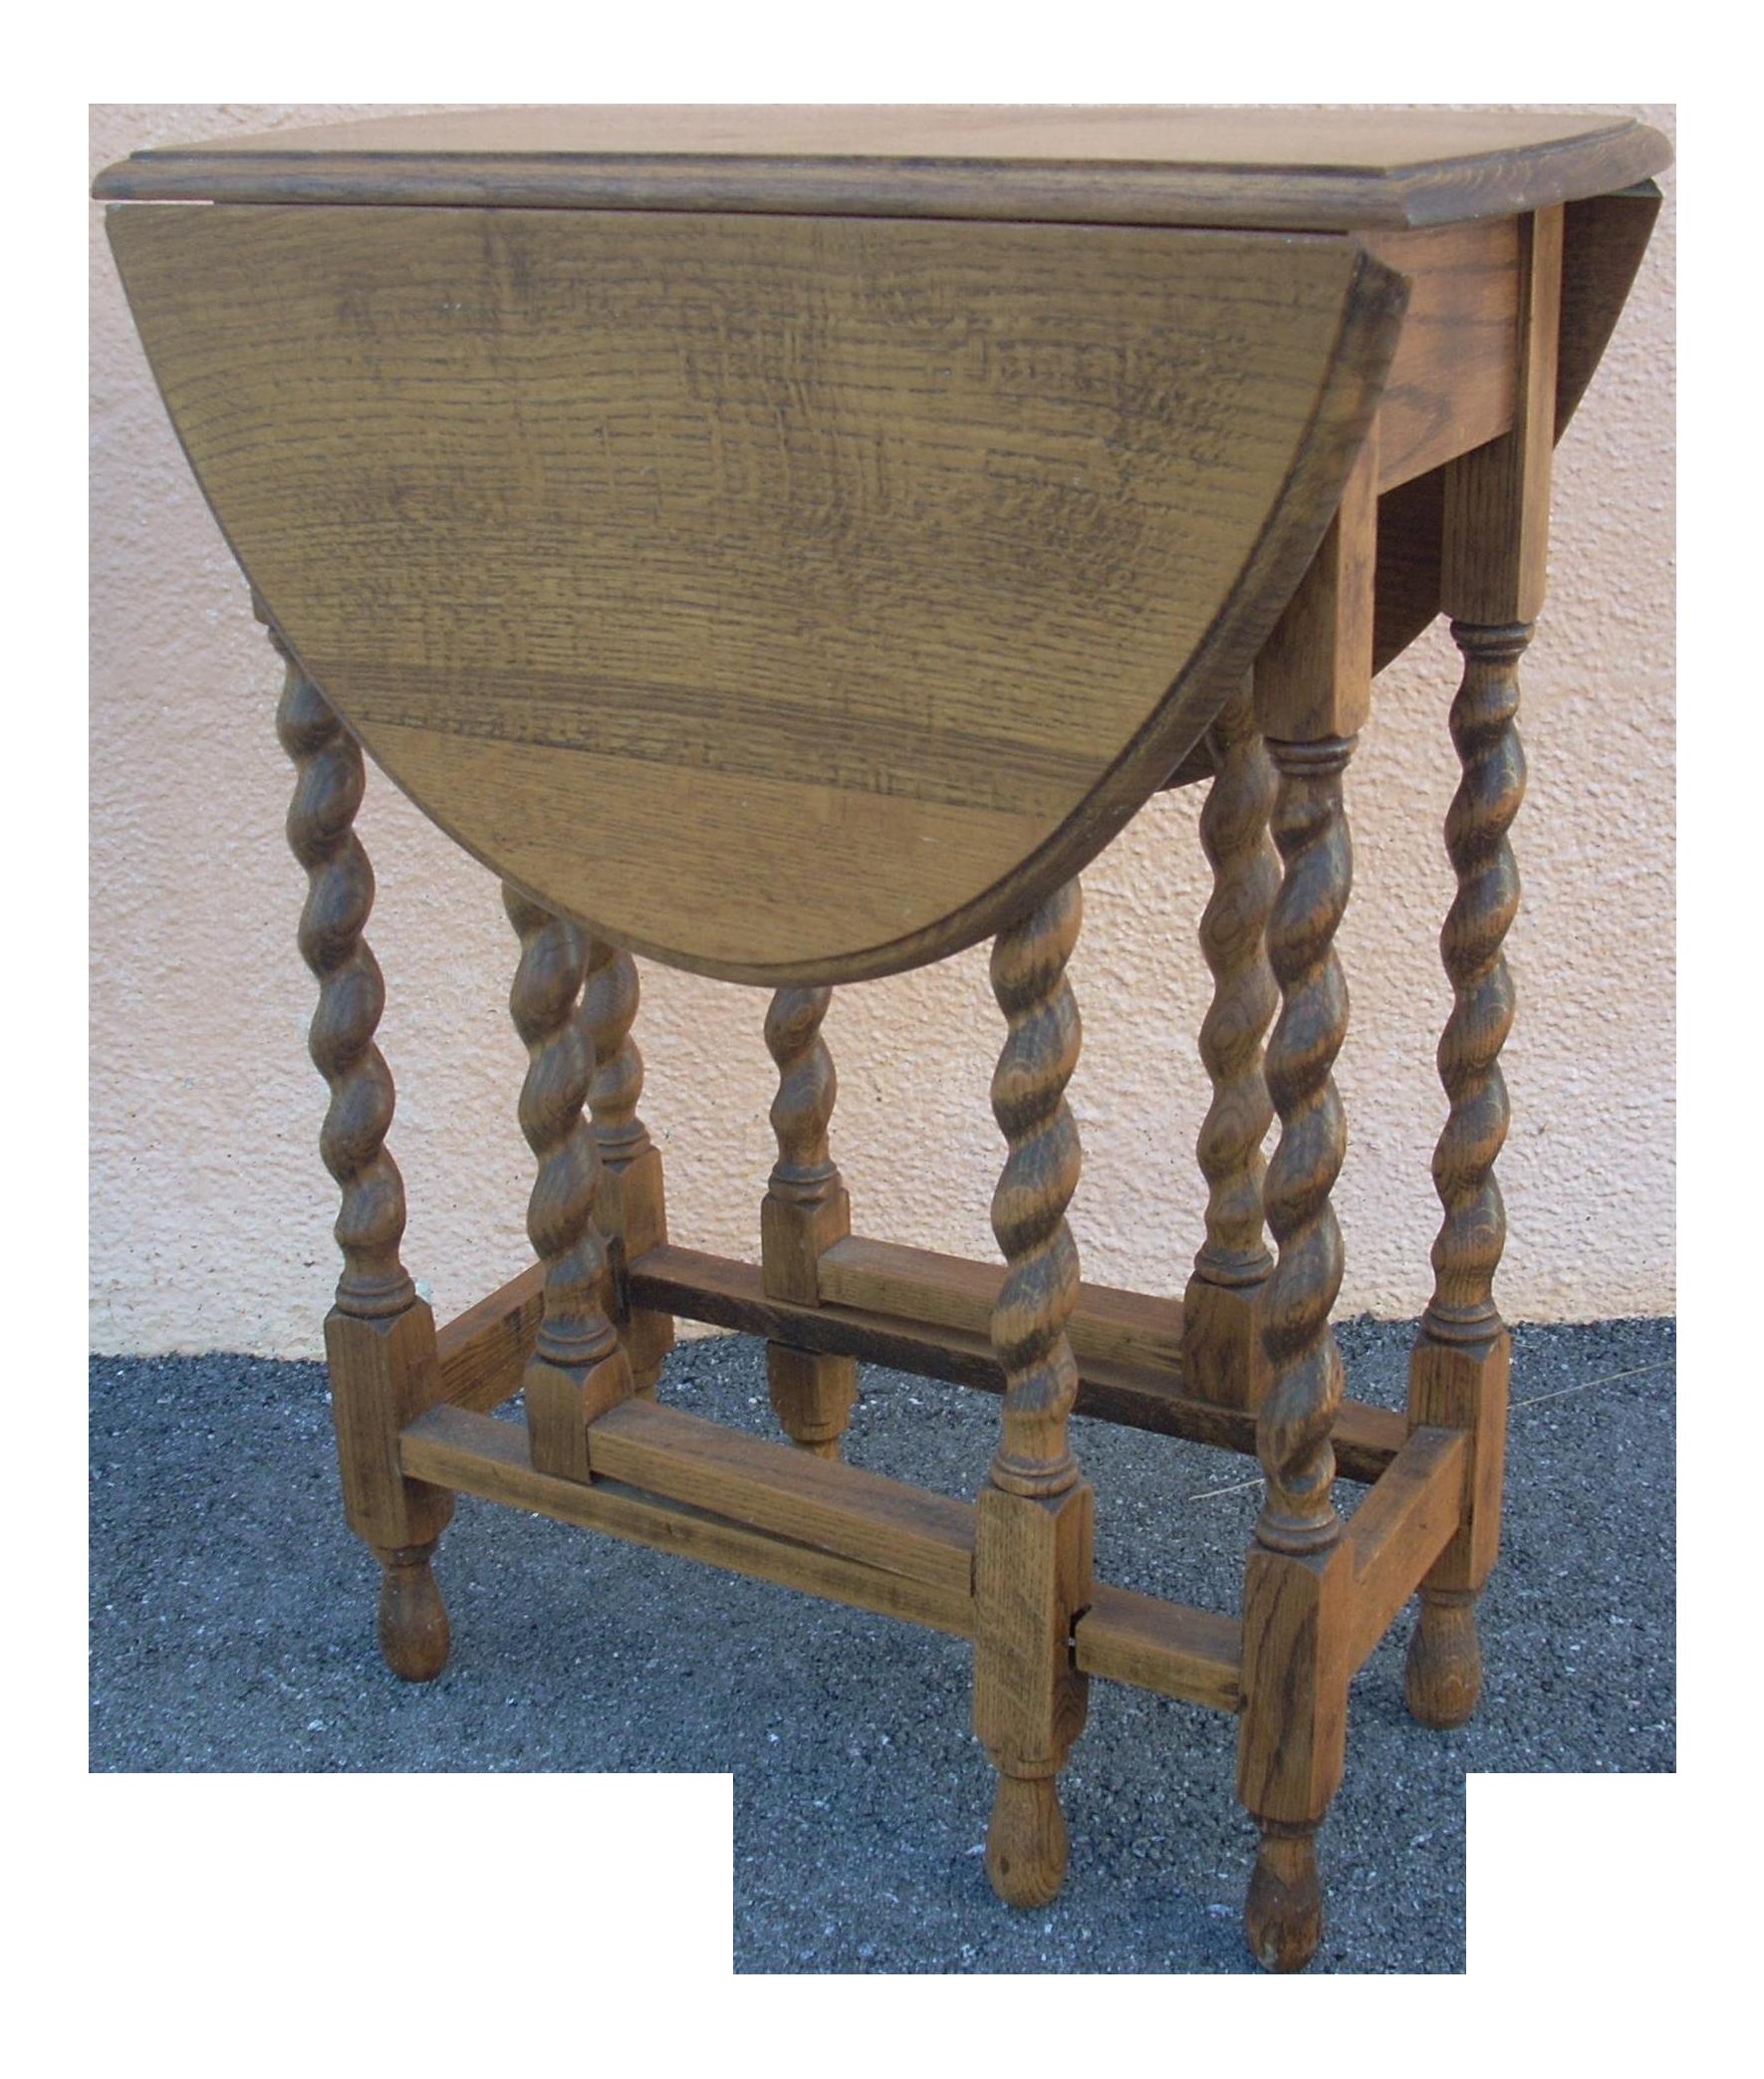 Ordinaire Antique English Gate Leg Table For Sale